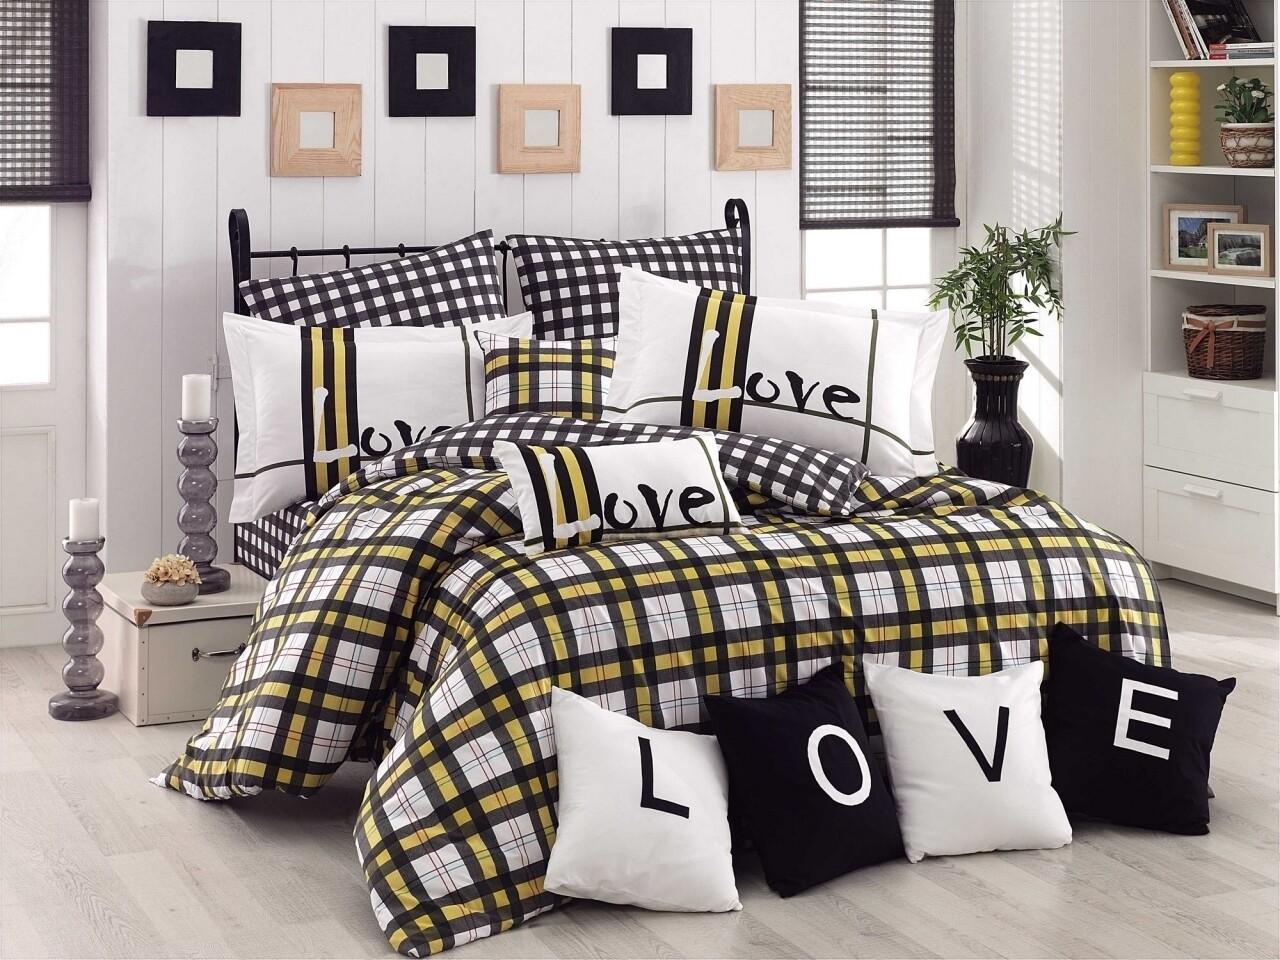 Lenjerie de pat pentru o persoana, 3 piese, 100% bumbac poplin, Hobby, Love Code, alb/negru